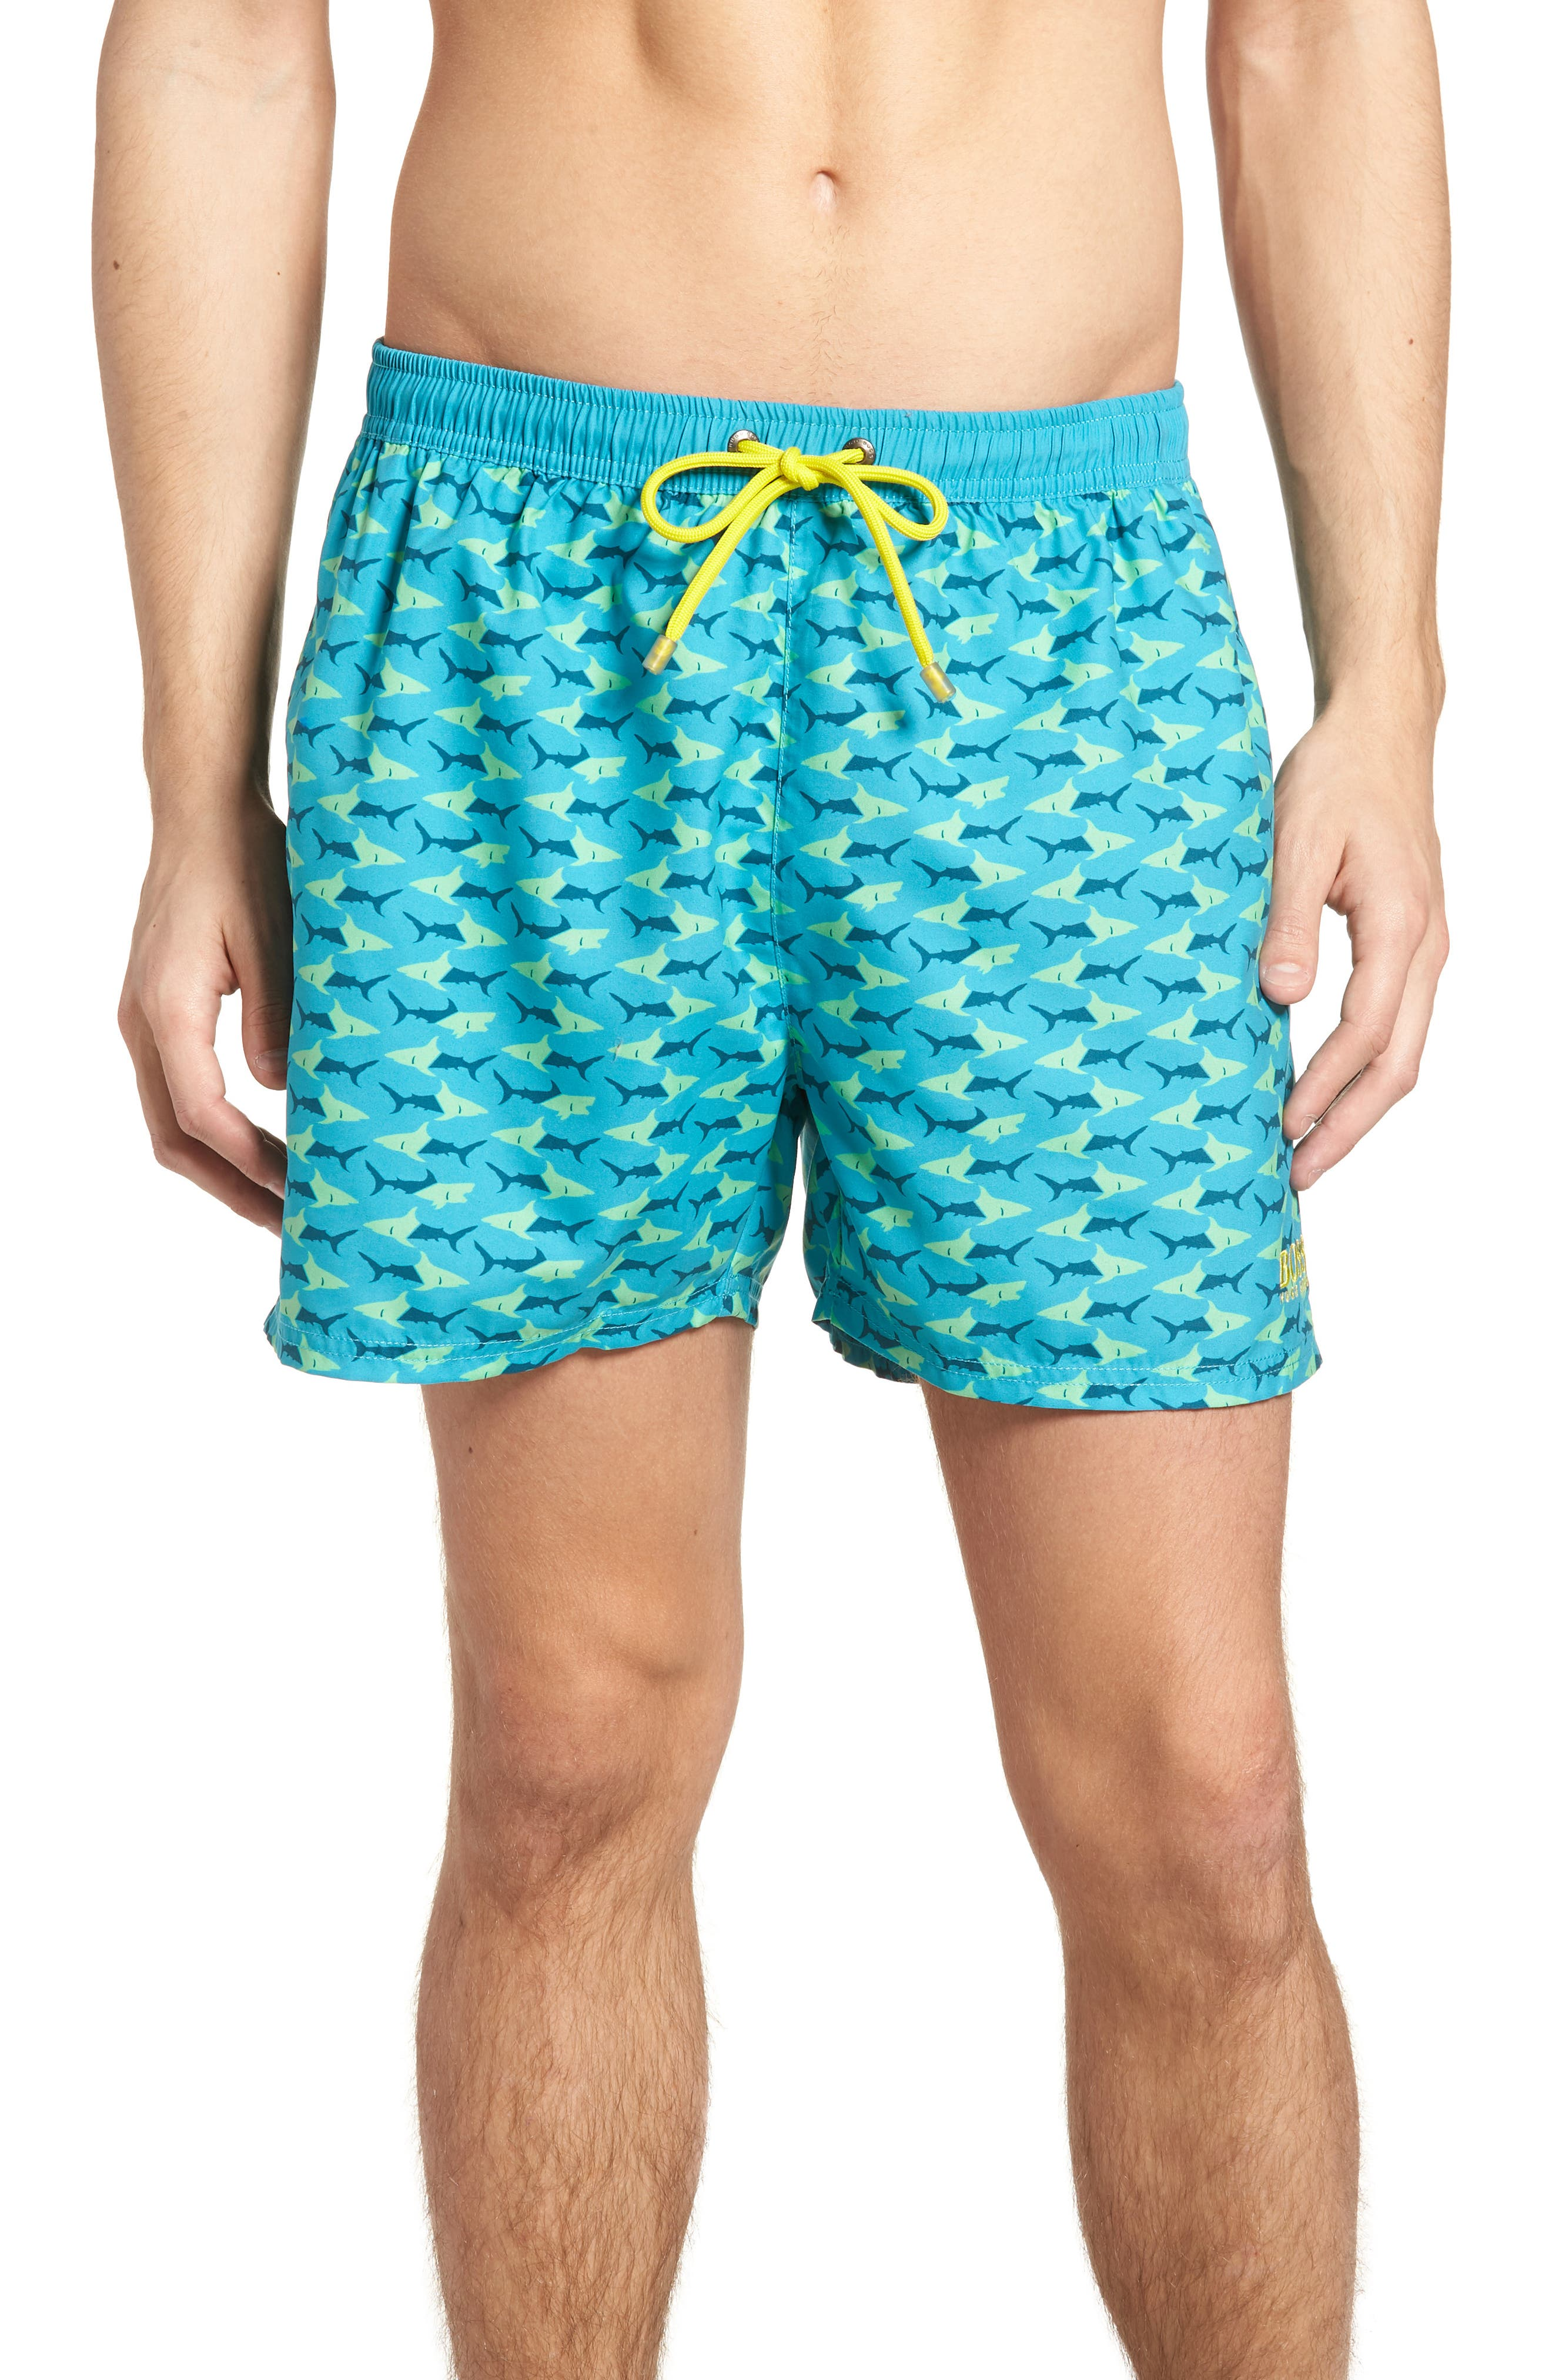 Piranha Shark Swim Trunks,                         Main,                         color, 480